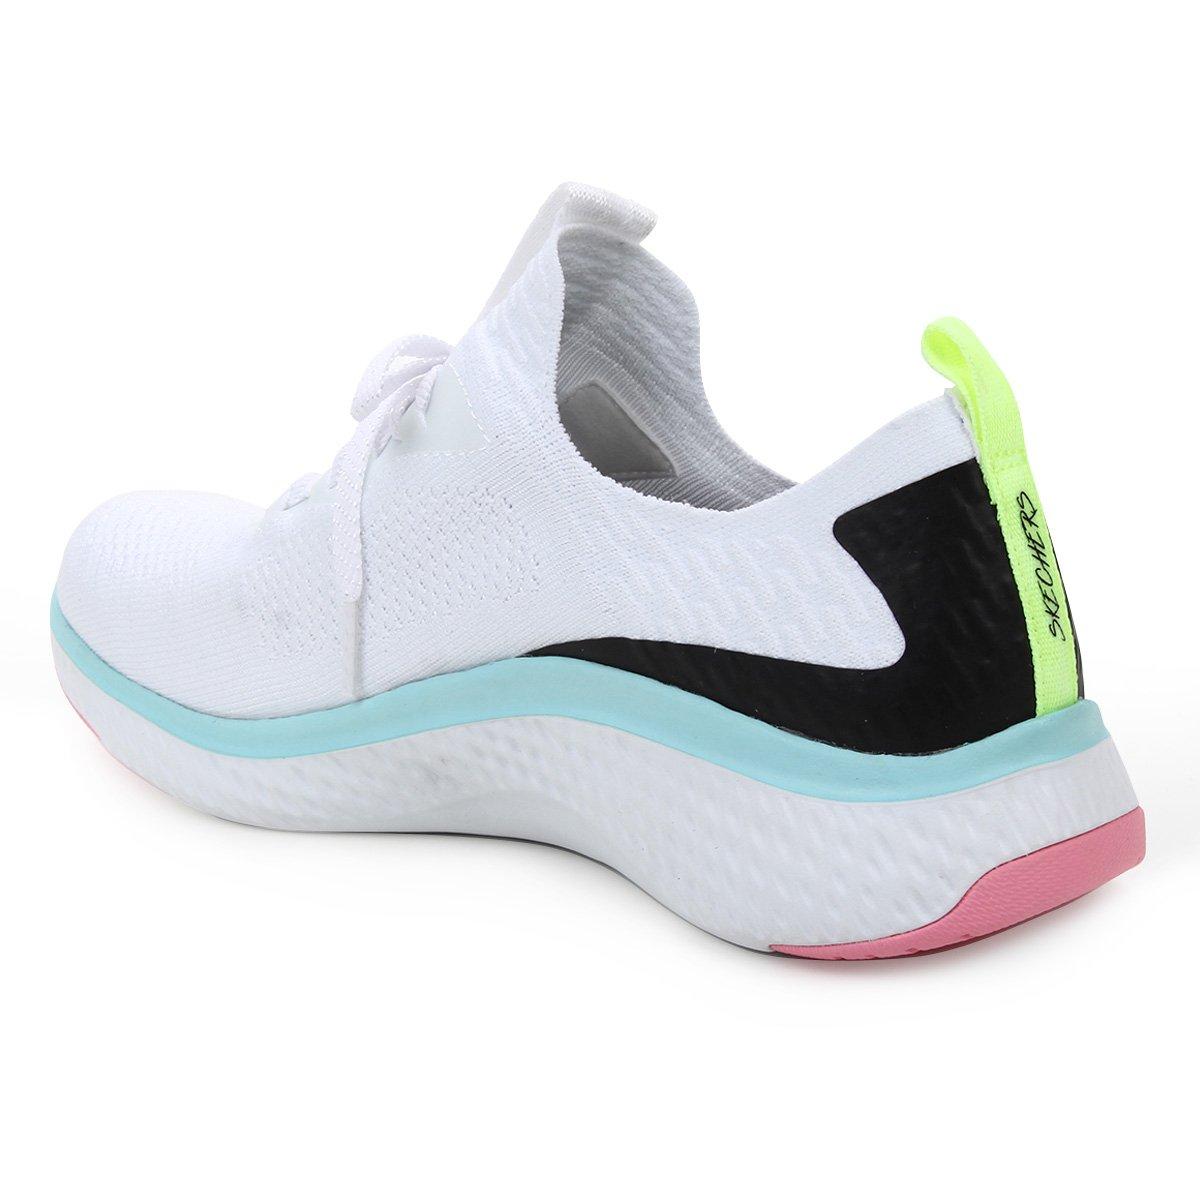 Tênis Skechers Solar Fuse Feminino - Branco e Azul